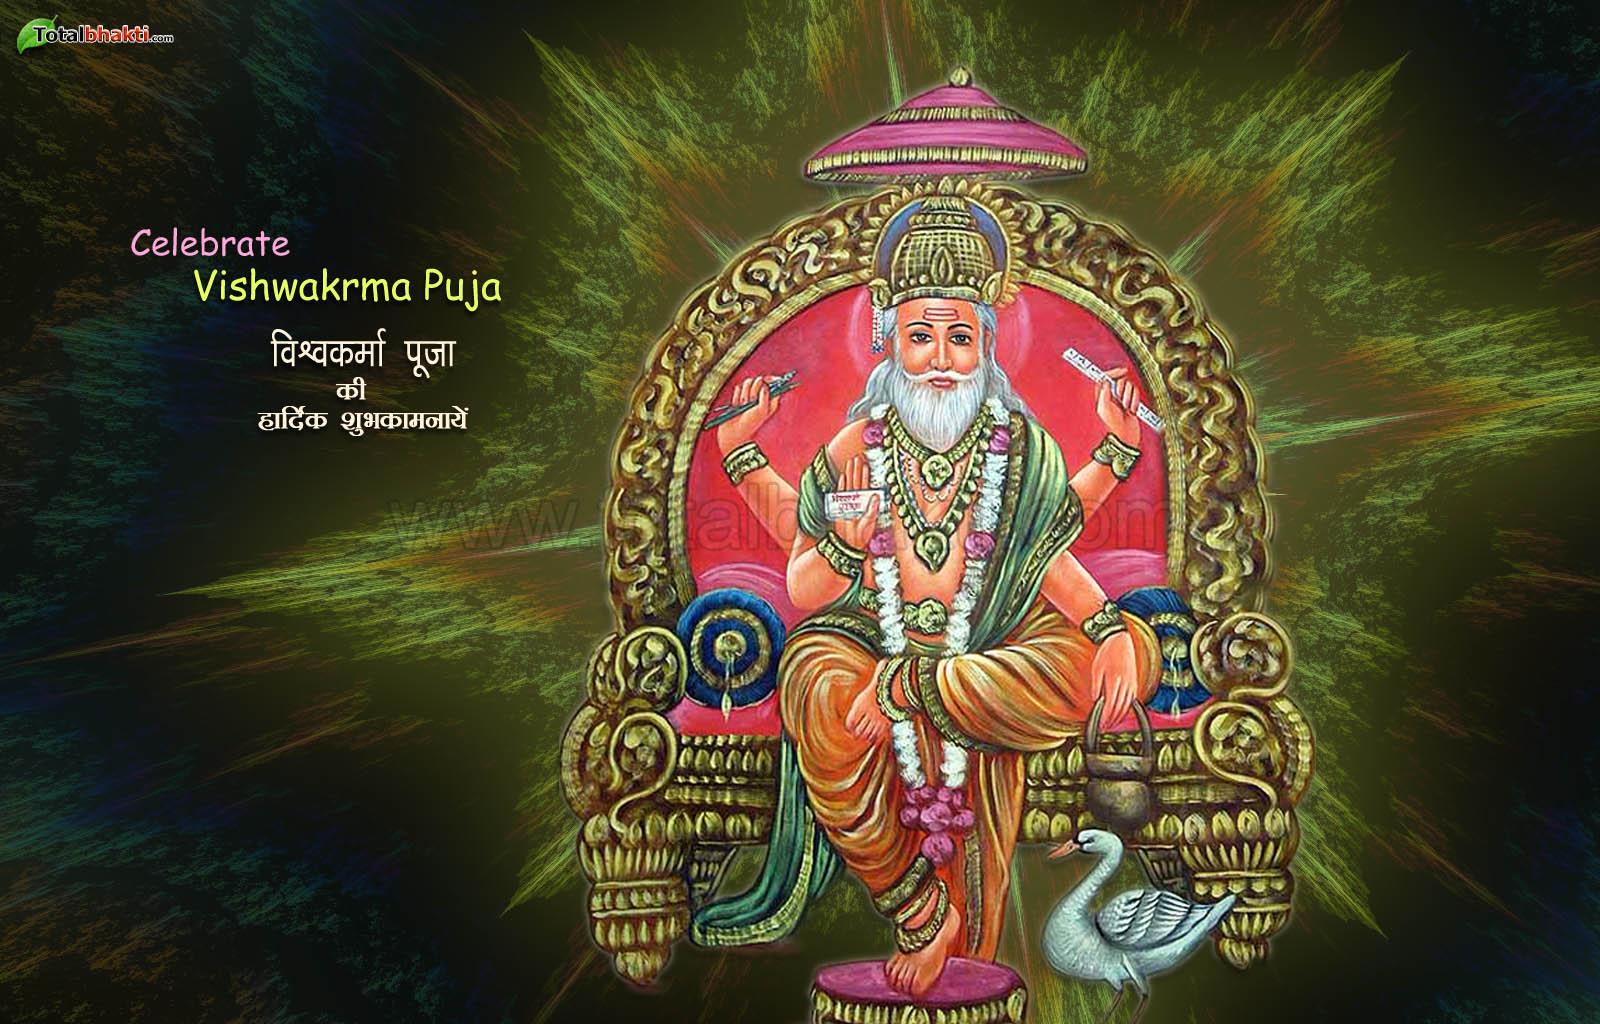 Vishwakarma Puja Images Gif Wallpapers Photos Pics For